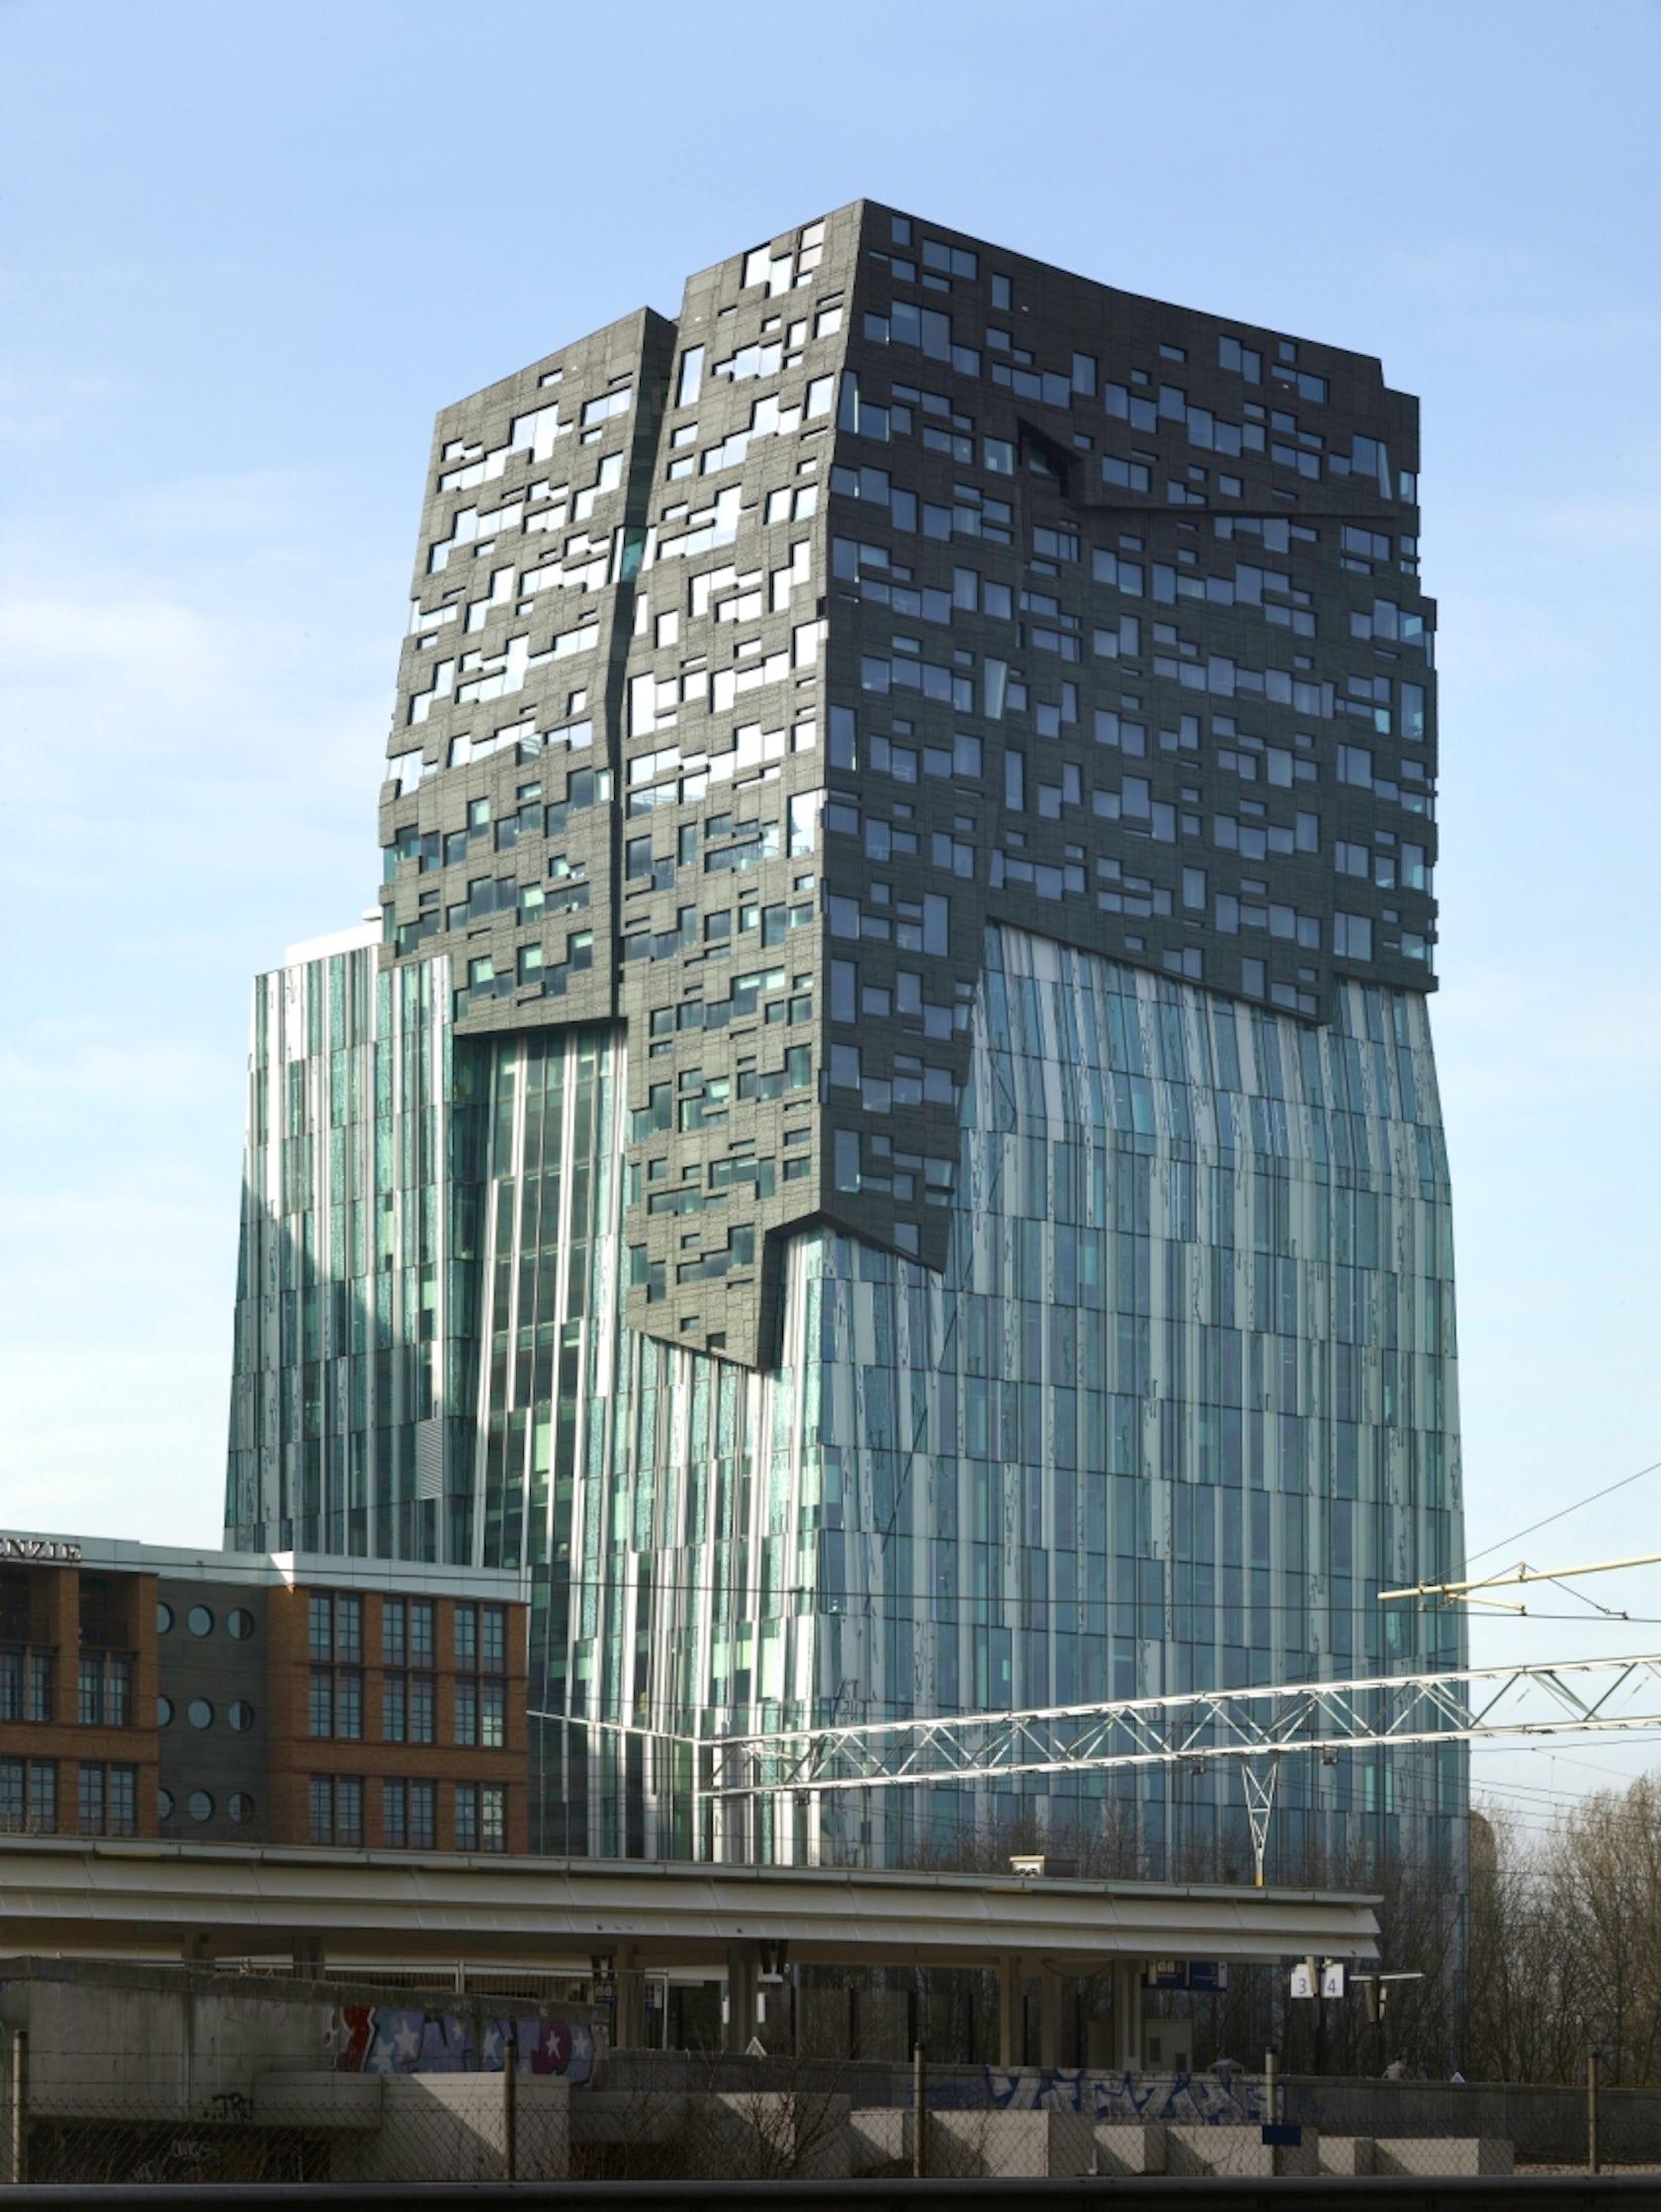 Capital City Auto >> Erick van Egeraat Office Tower Amsterdam - Architizer